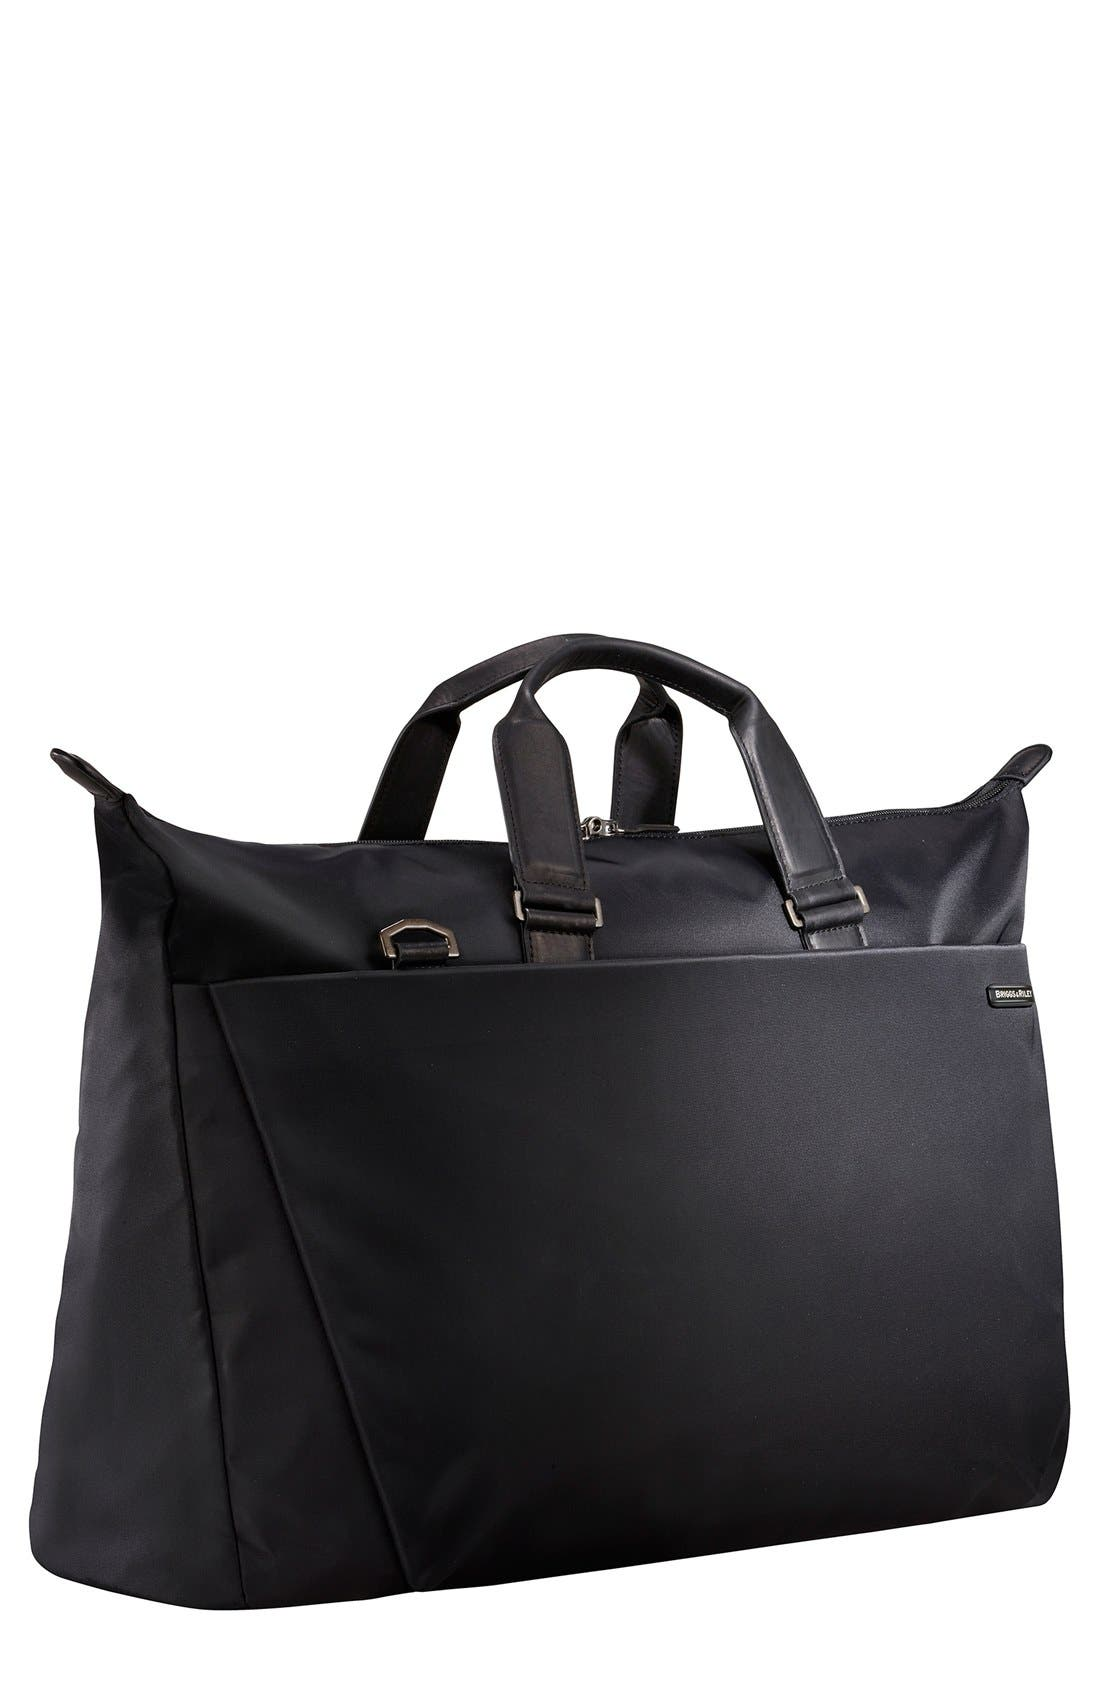 Sympatico 22-Inch Duffel Bag,                         Main,                         color,